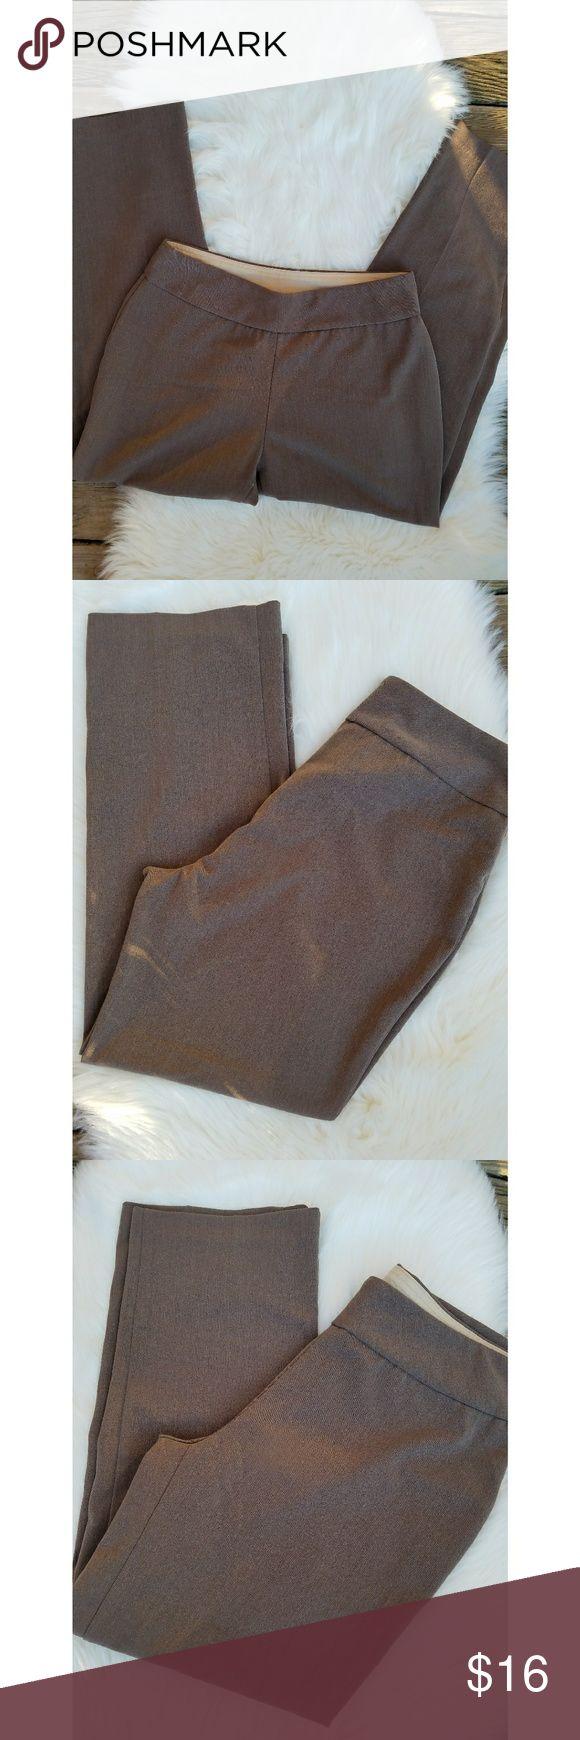 Investments Petites Leggings/Pants Investments Petites Leggings/Pants  Size 10 Like New Condition 1. State Pants Leggings